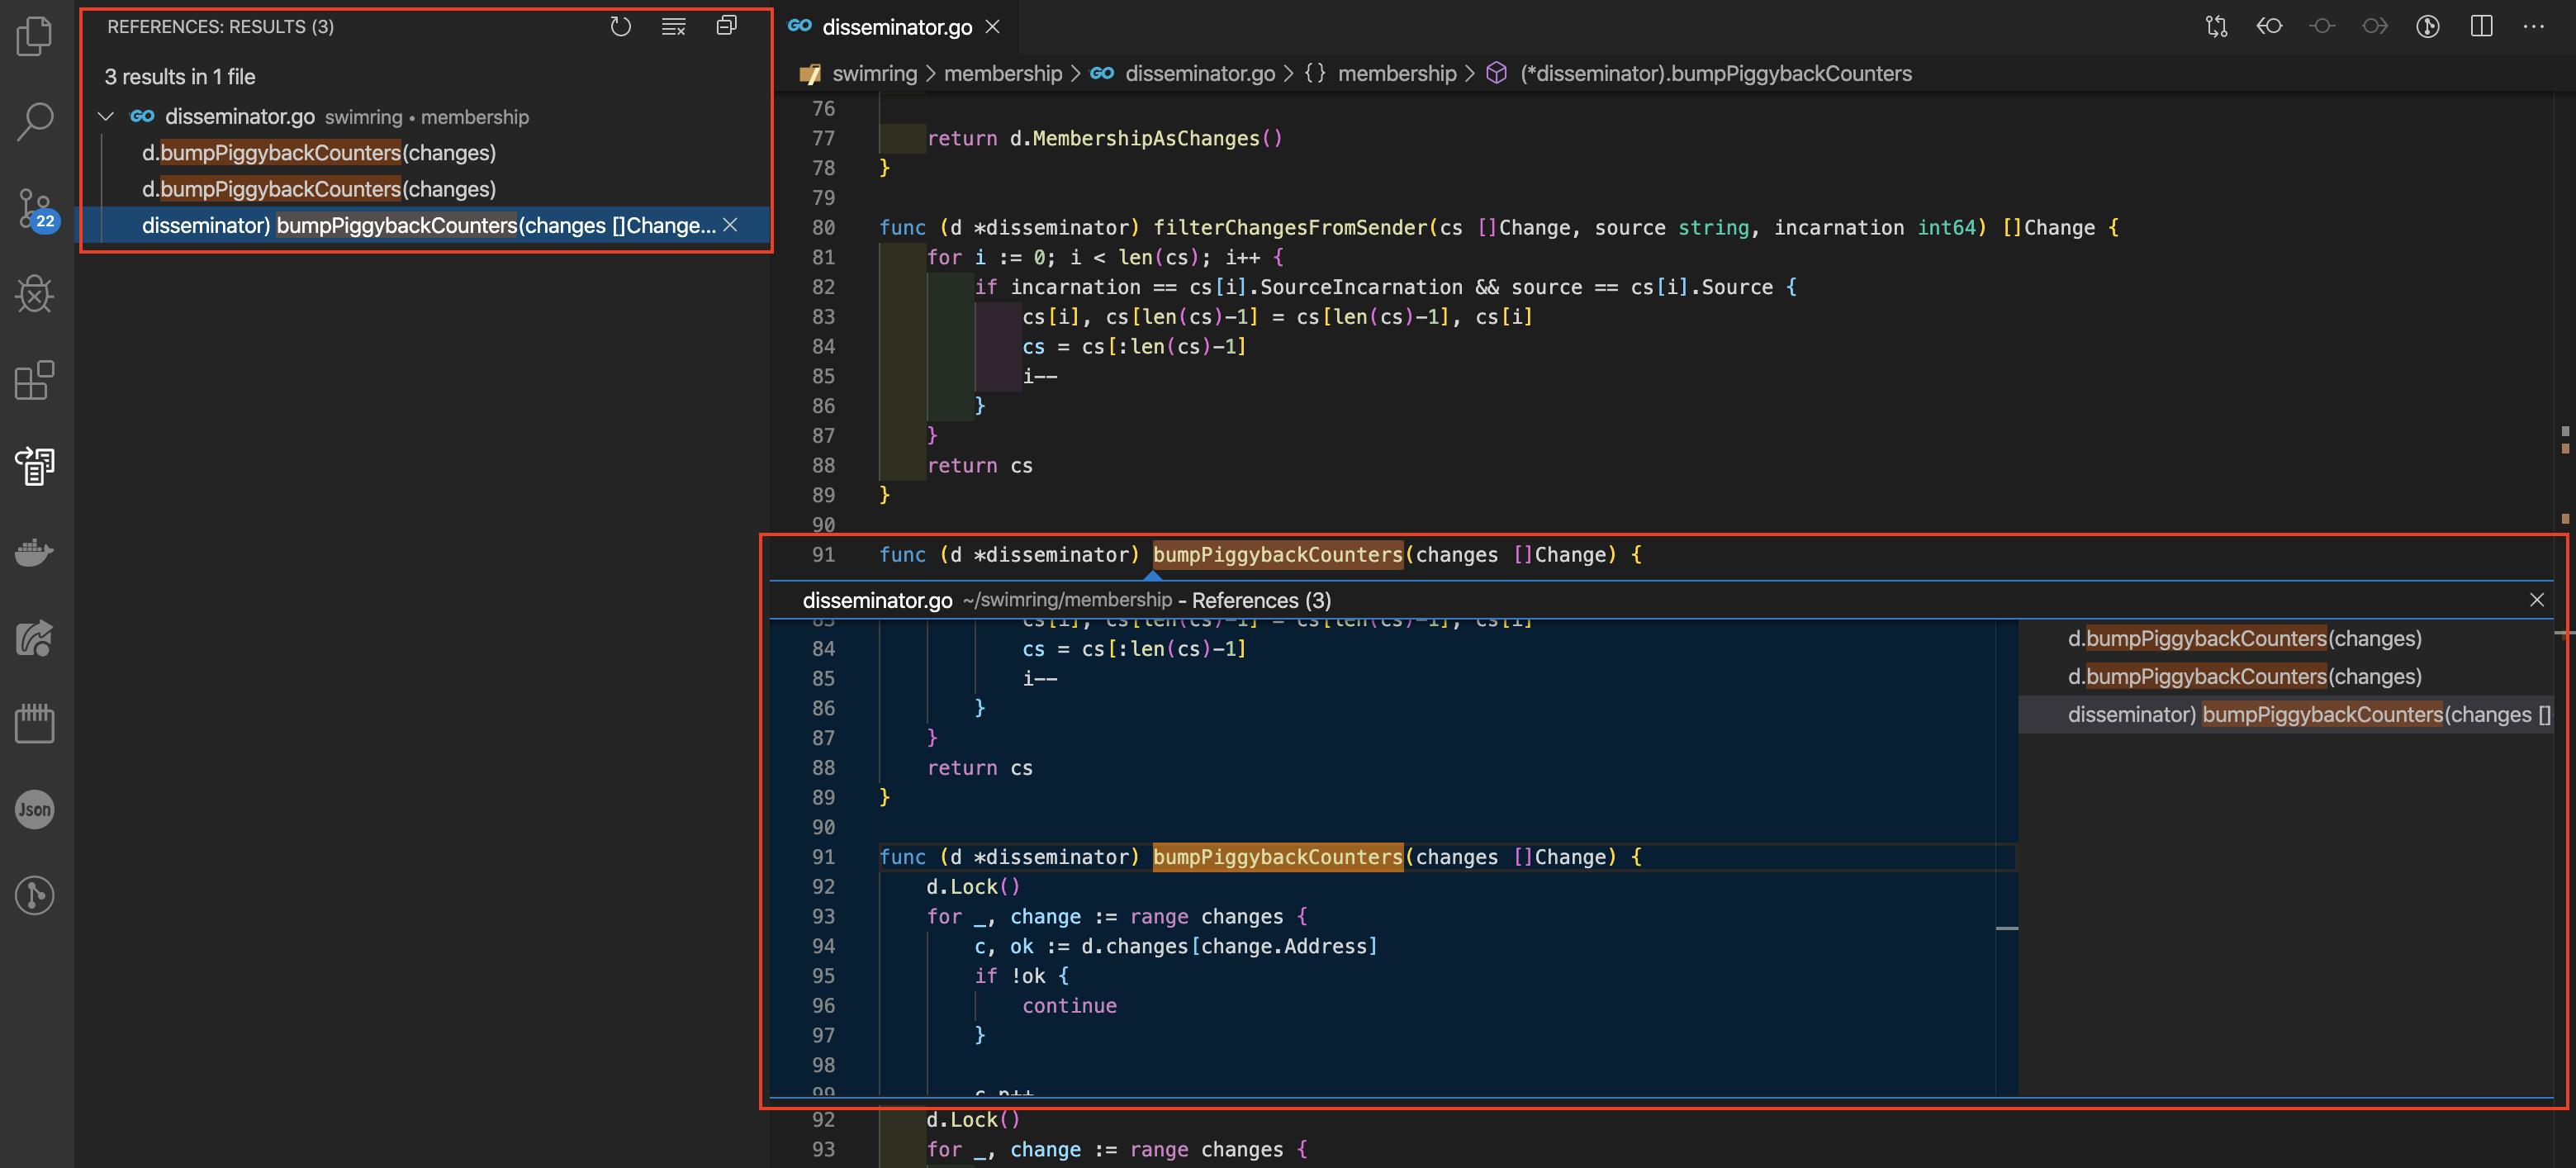 Visual Studio CodeとIntelliJ IDEAを比較してみた